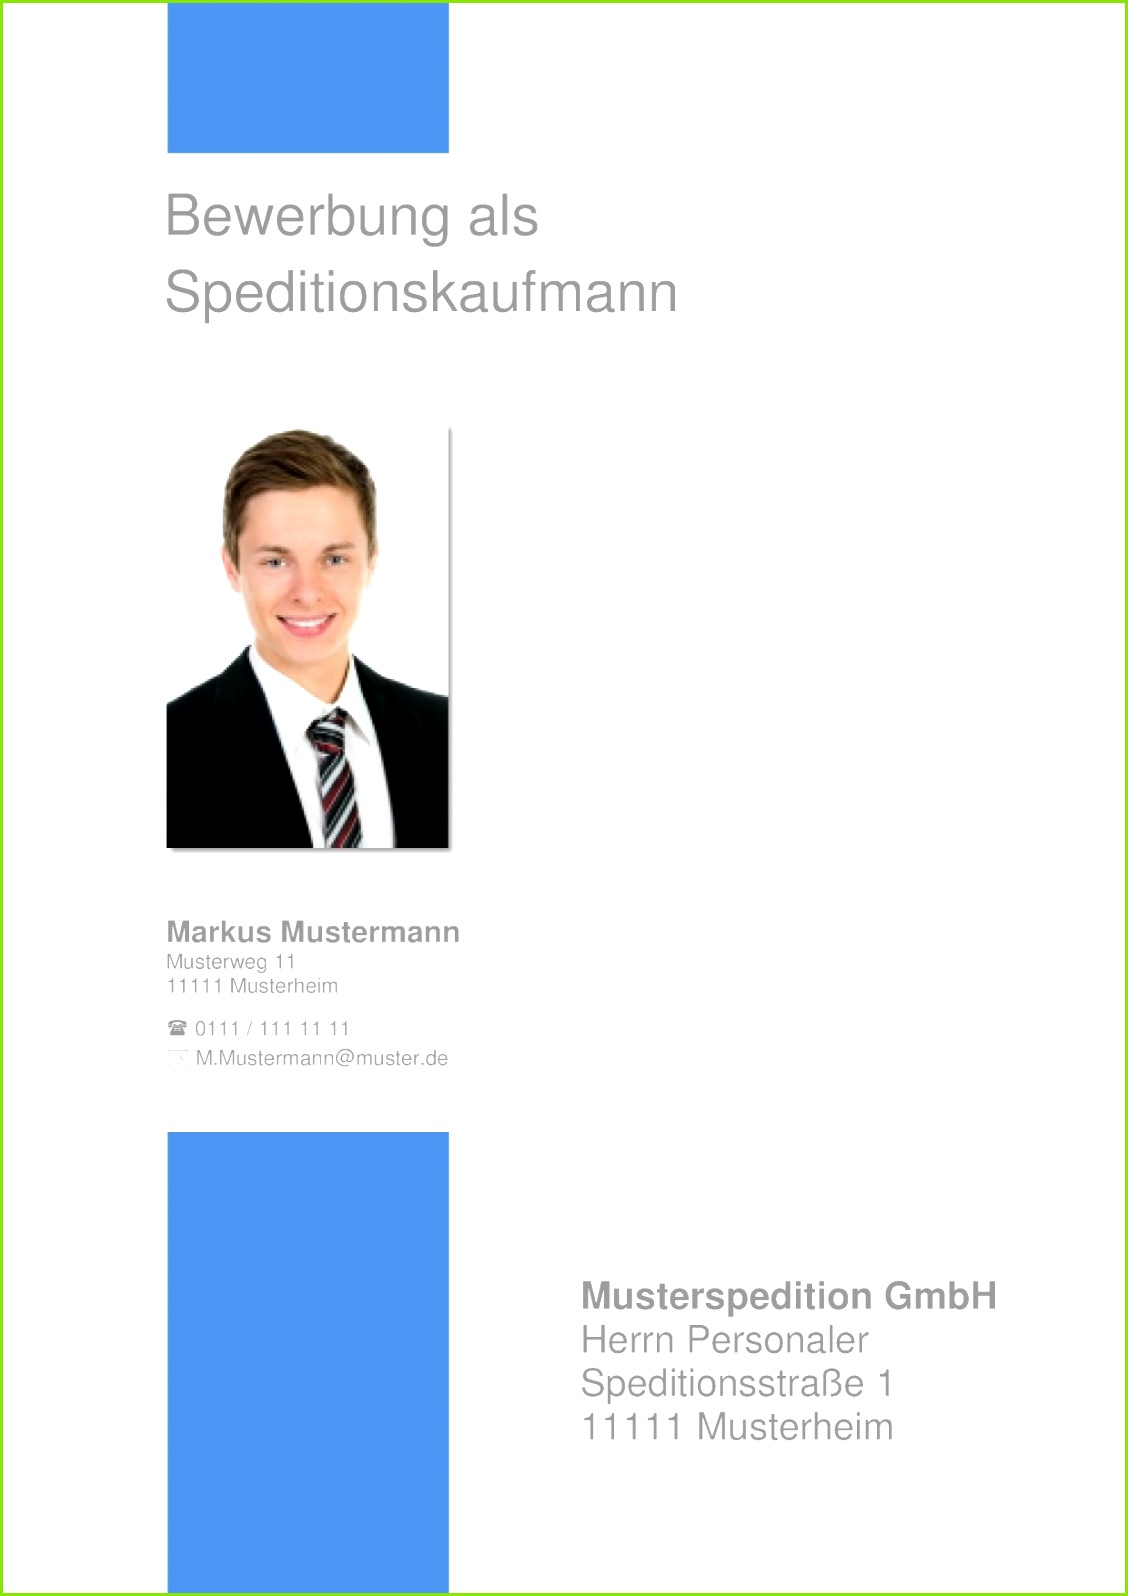 Deckblatt Bewerbung 17 Kaufmann Kauffrau oder Speditionskaufmann bzw Bürokaufmann und Bürokauffrau